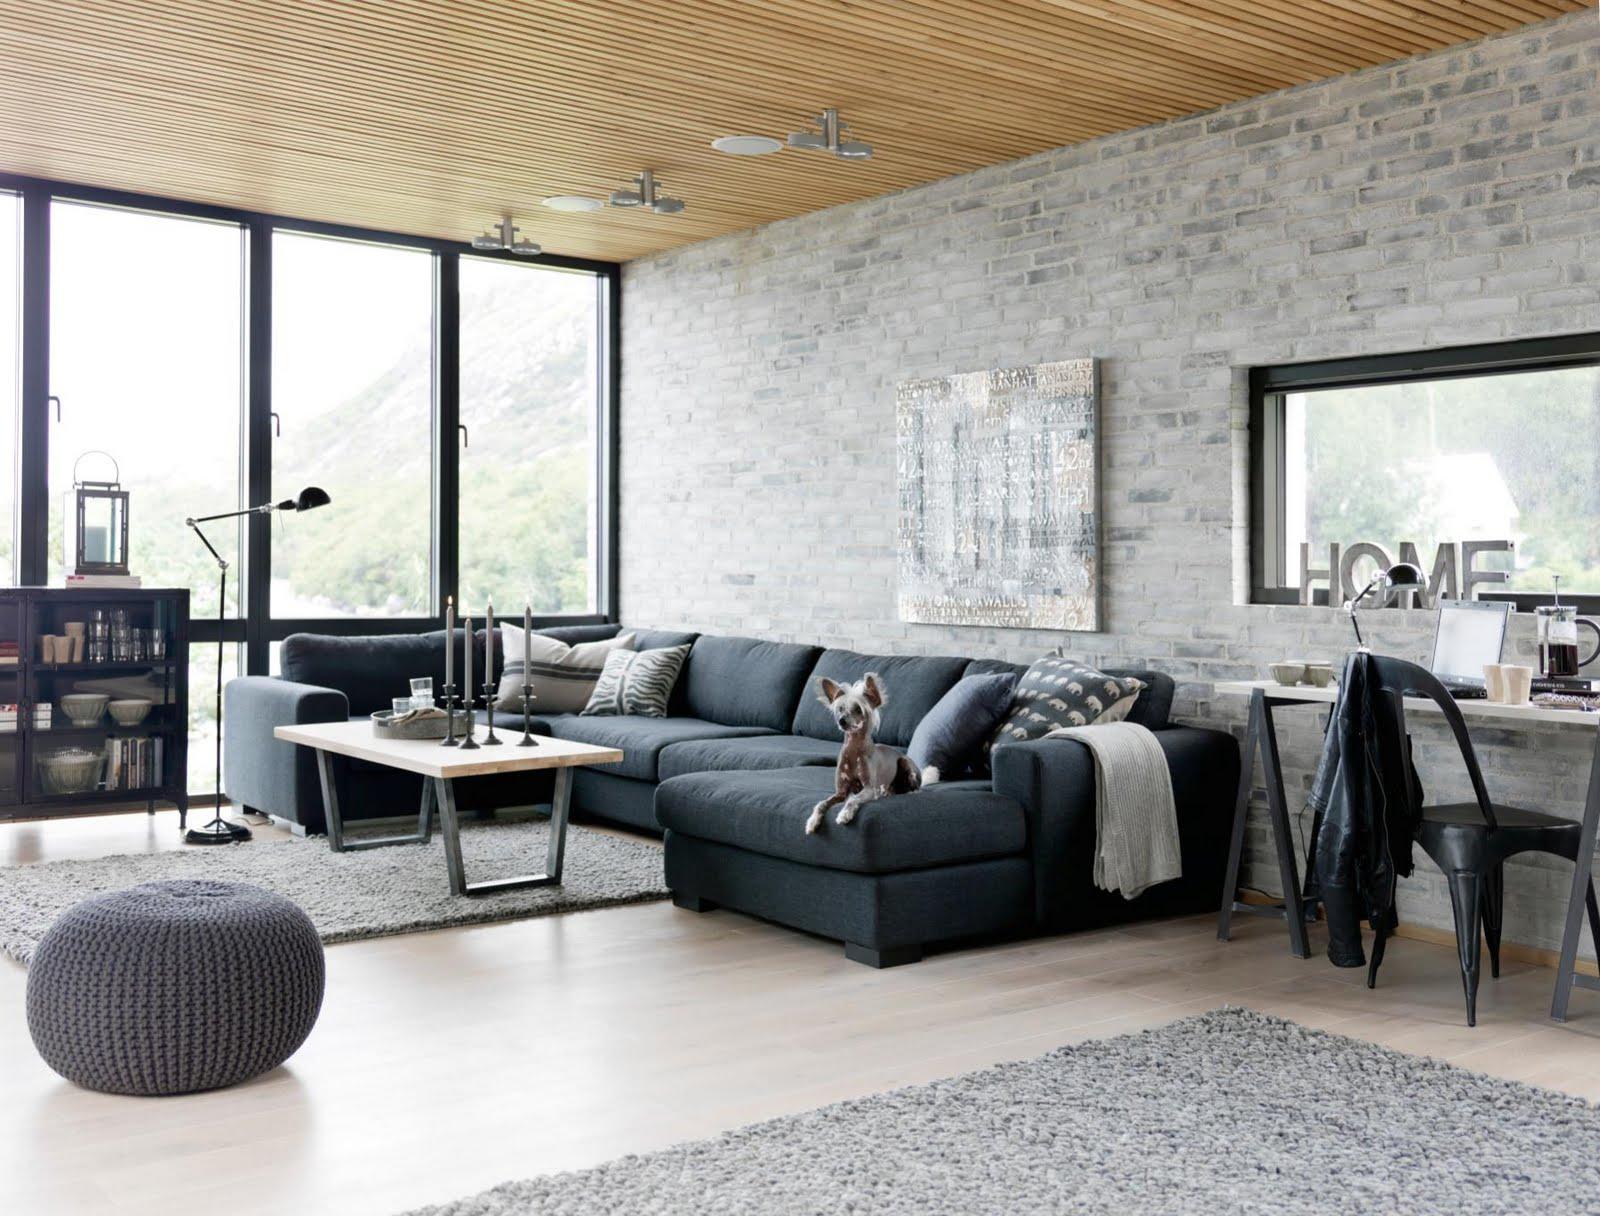 Gl Door Nu Look Home Design on house design, beautiful home exterior design, h&m home design,